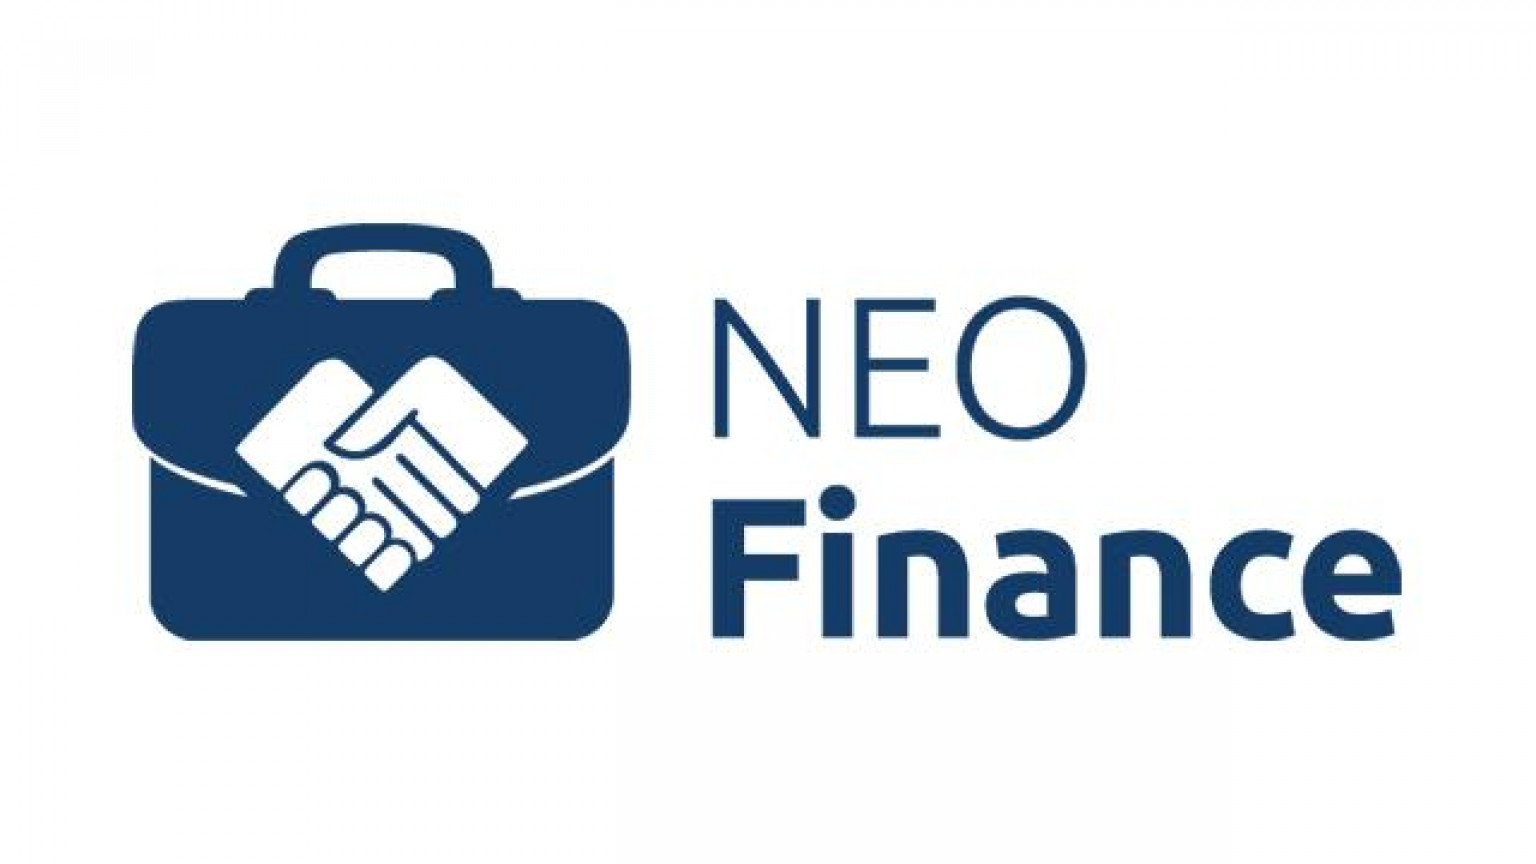 Logo of personal p2p lending platform NEO Finance